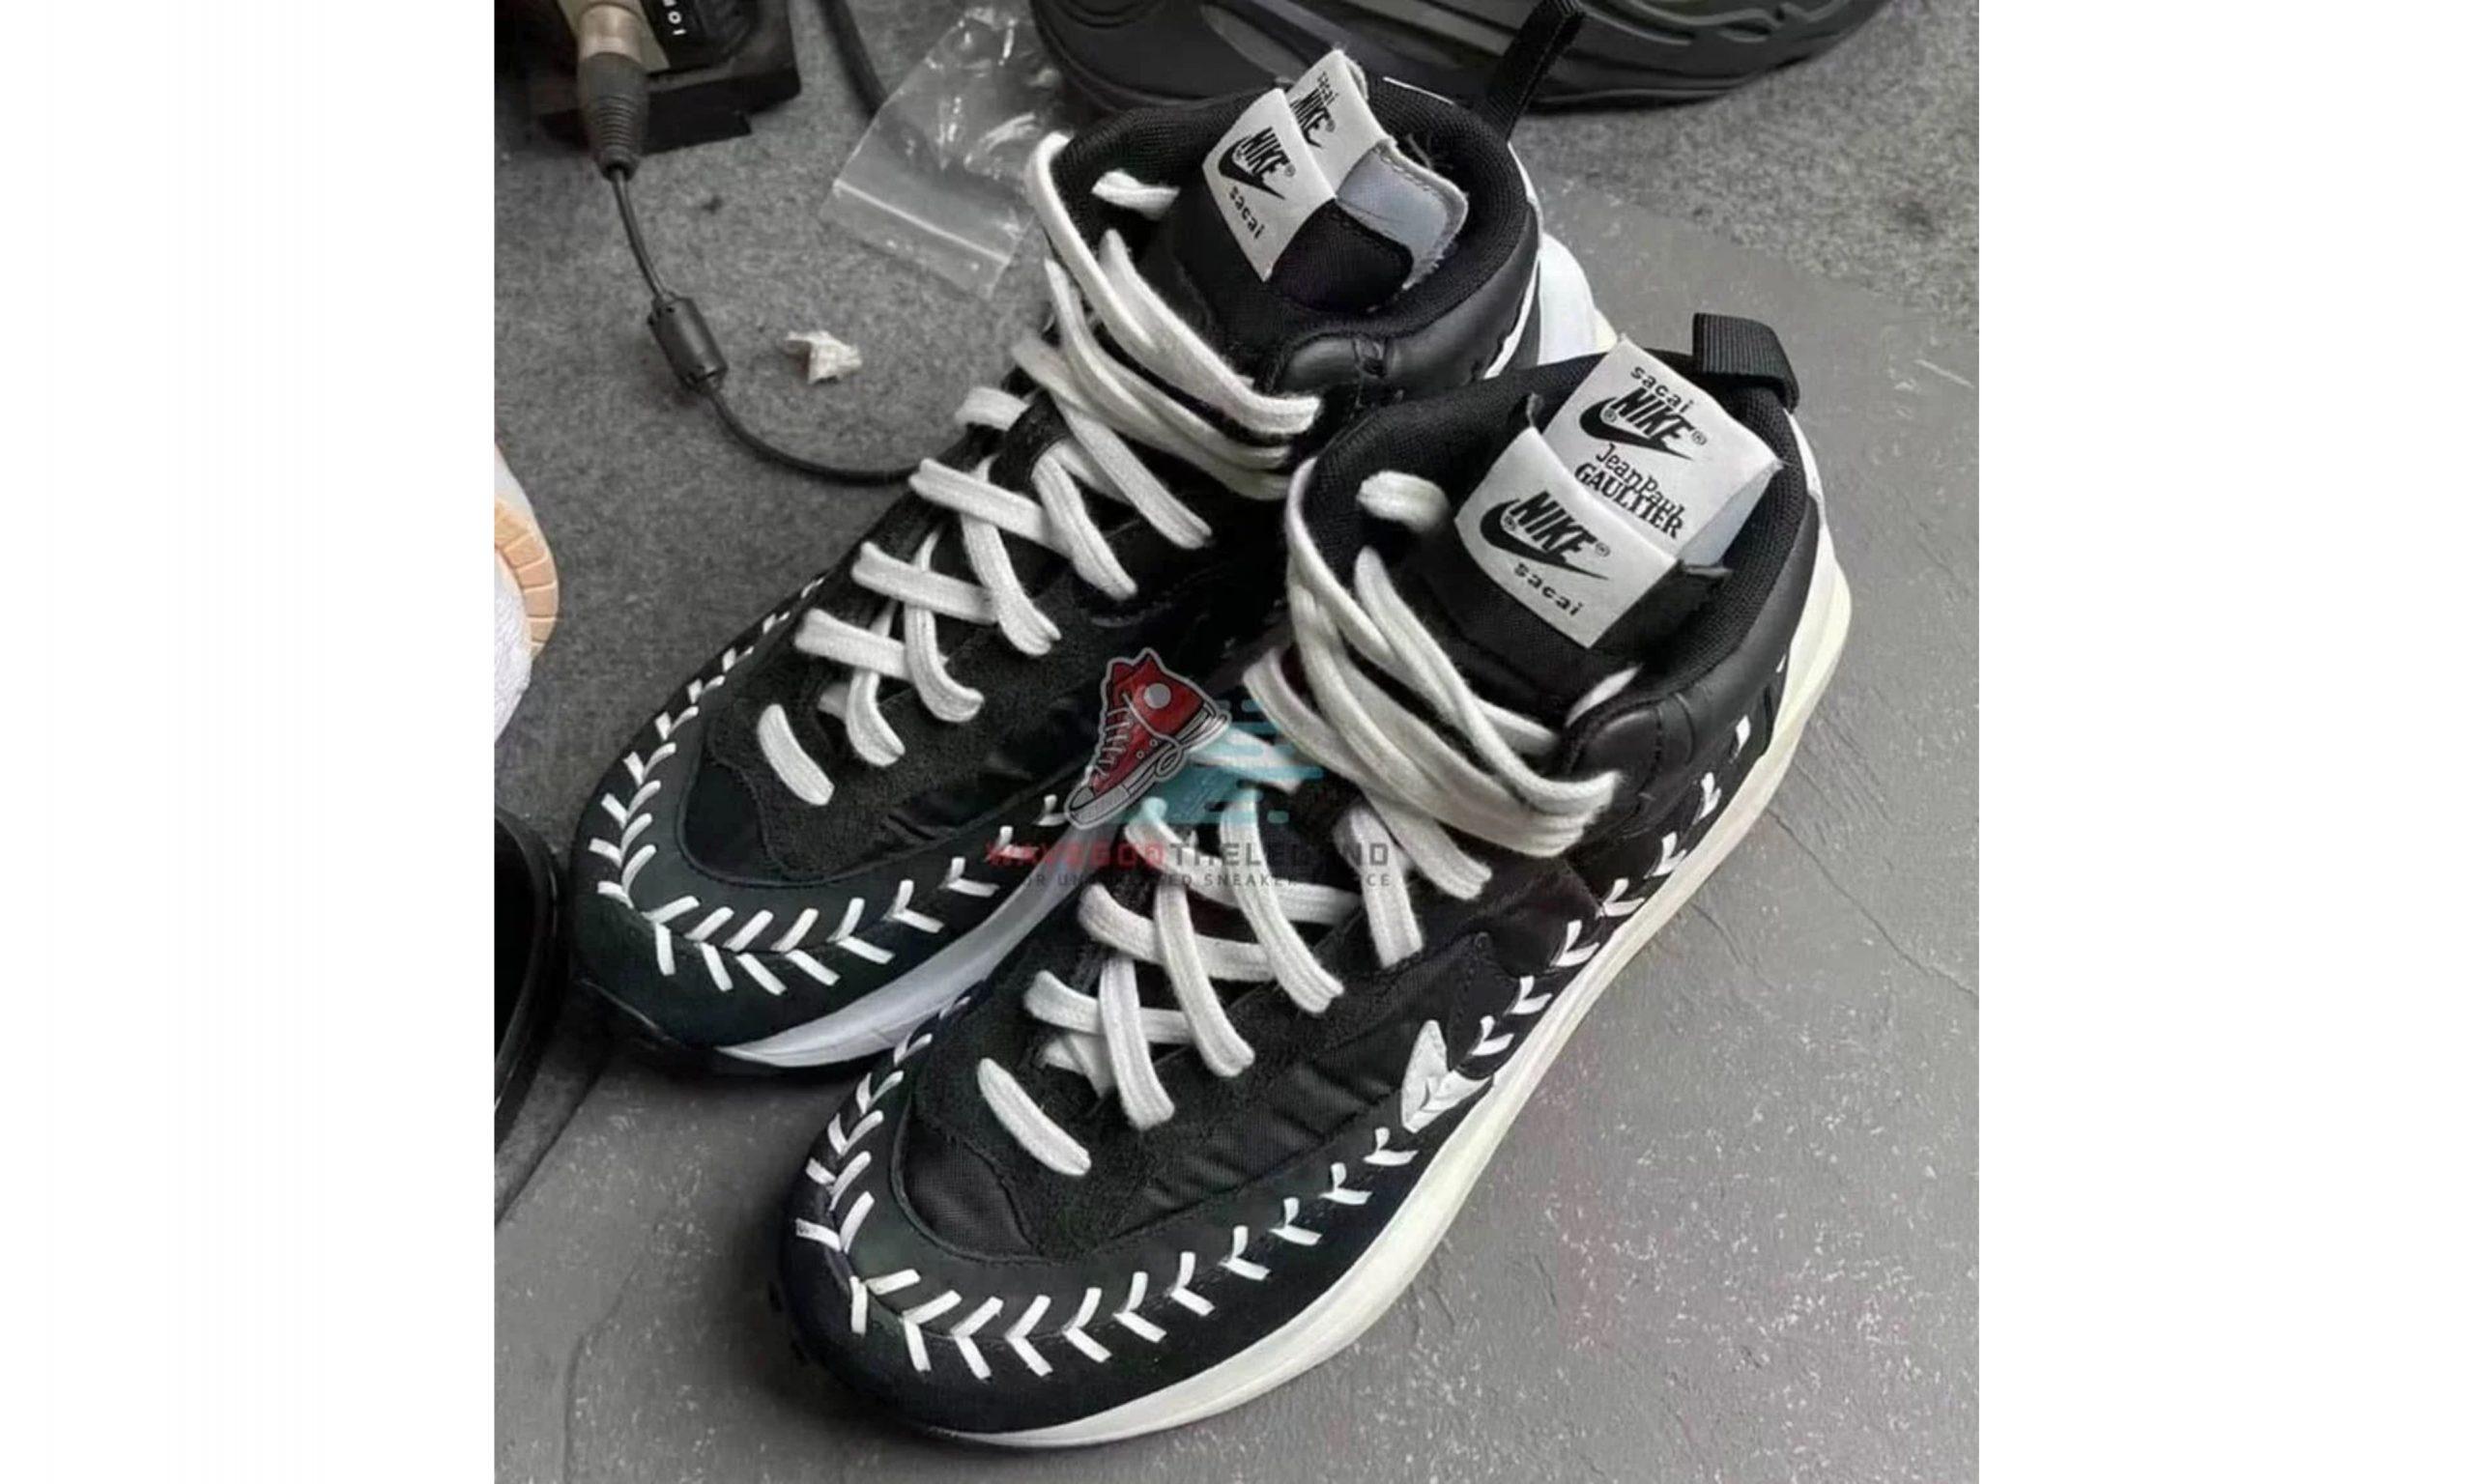 sacai x Nike x Jean Paul Gaultier 三方联名首度公开